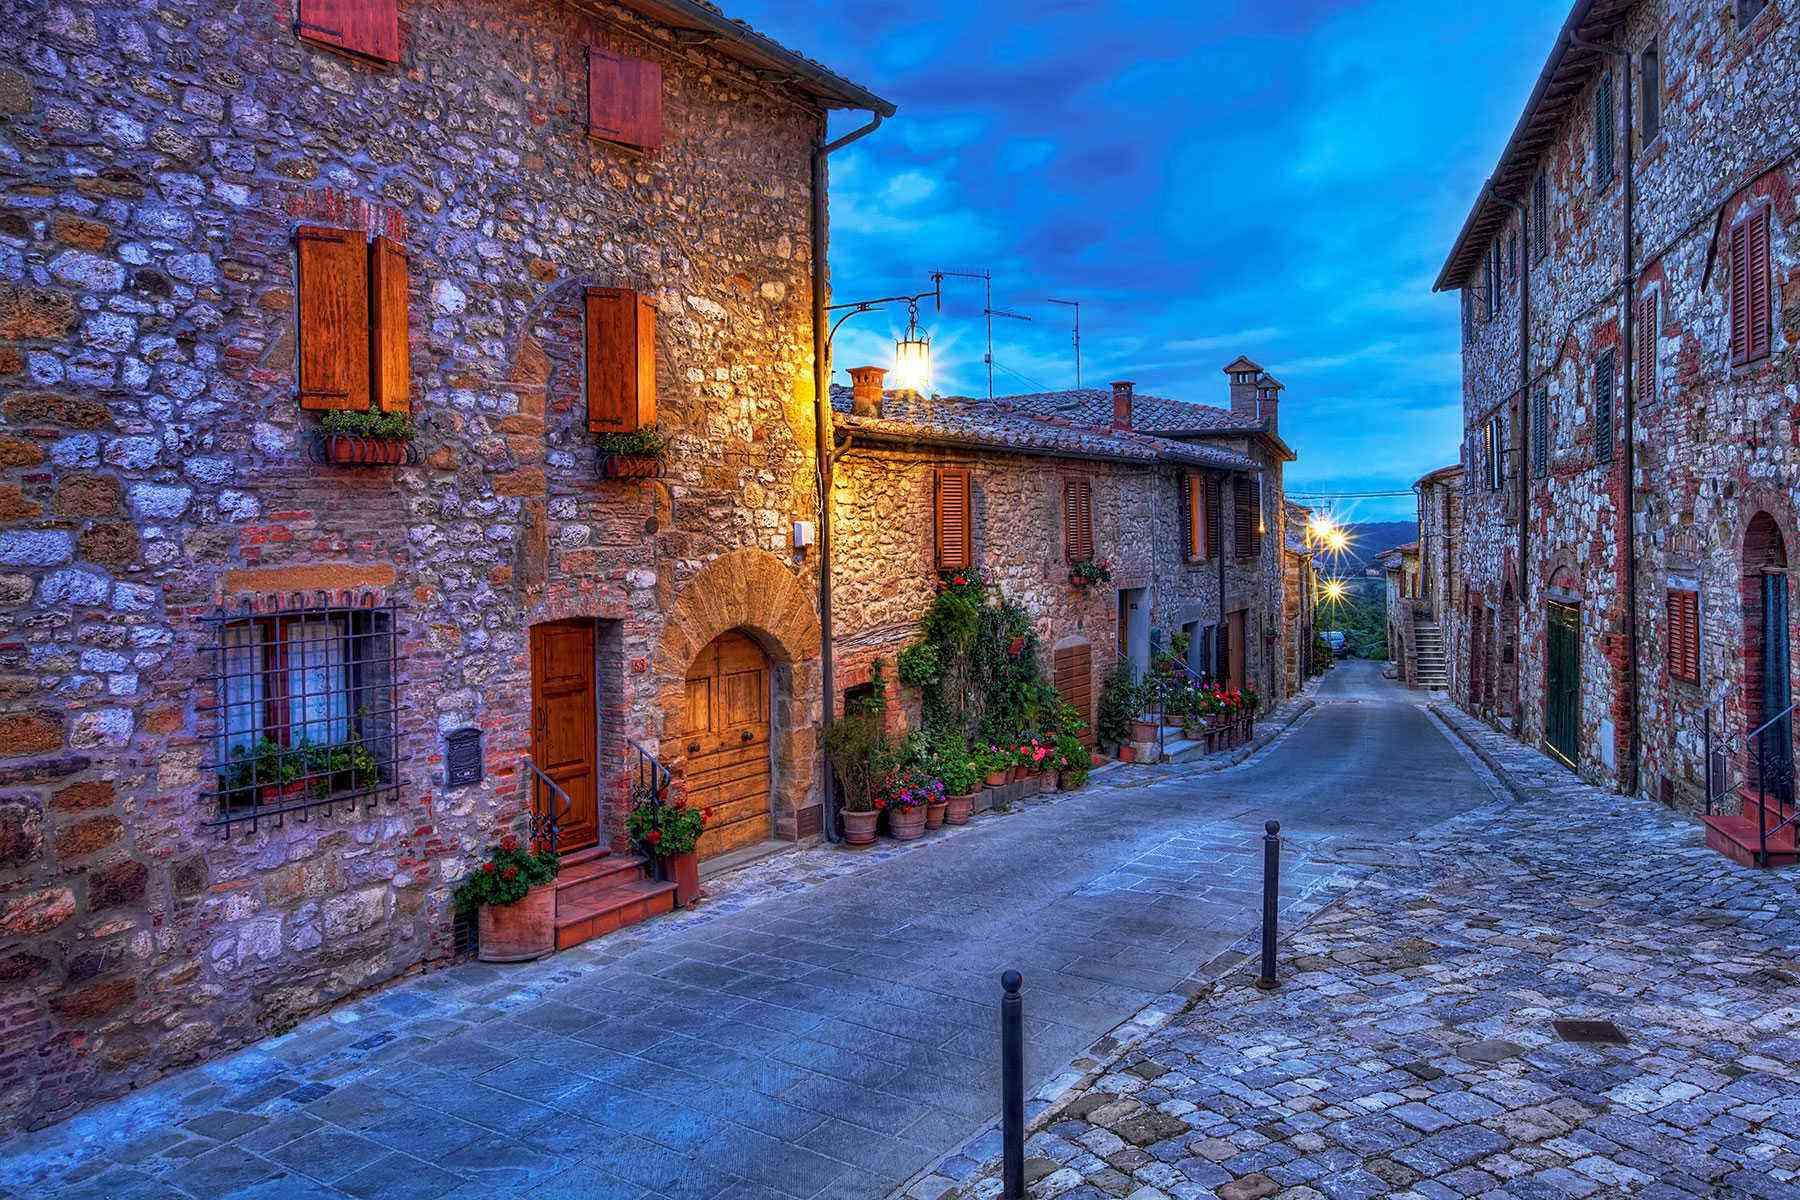 Medieval-Italian-Towns-Montefollonico